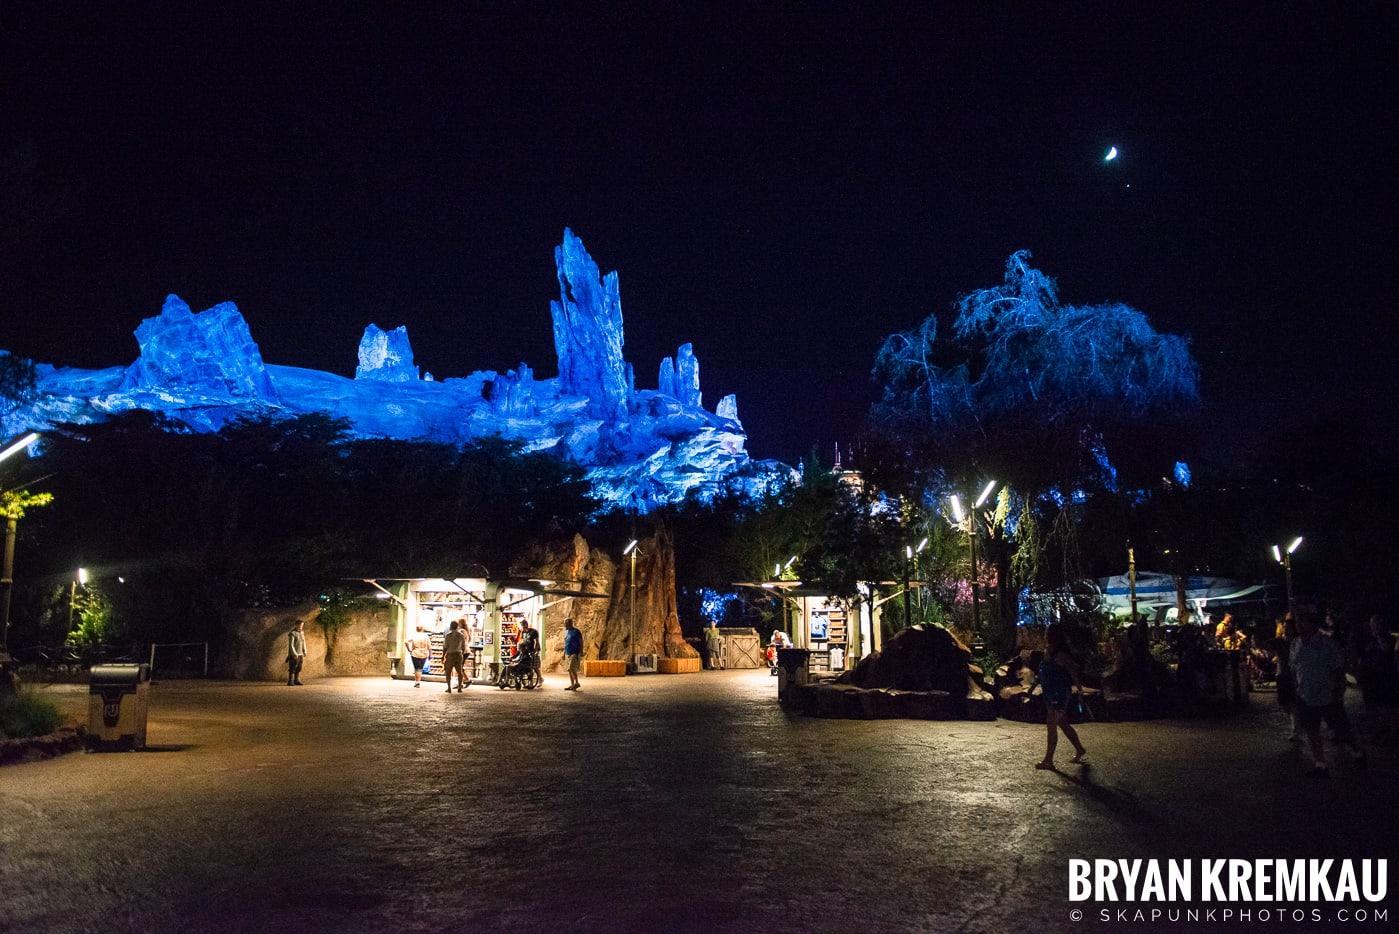 Walt Disney World Vacation: Day 5 (Animal Kingdom / Disney's Hollywood Studios) - 10.3.19 (41)